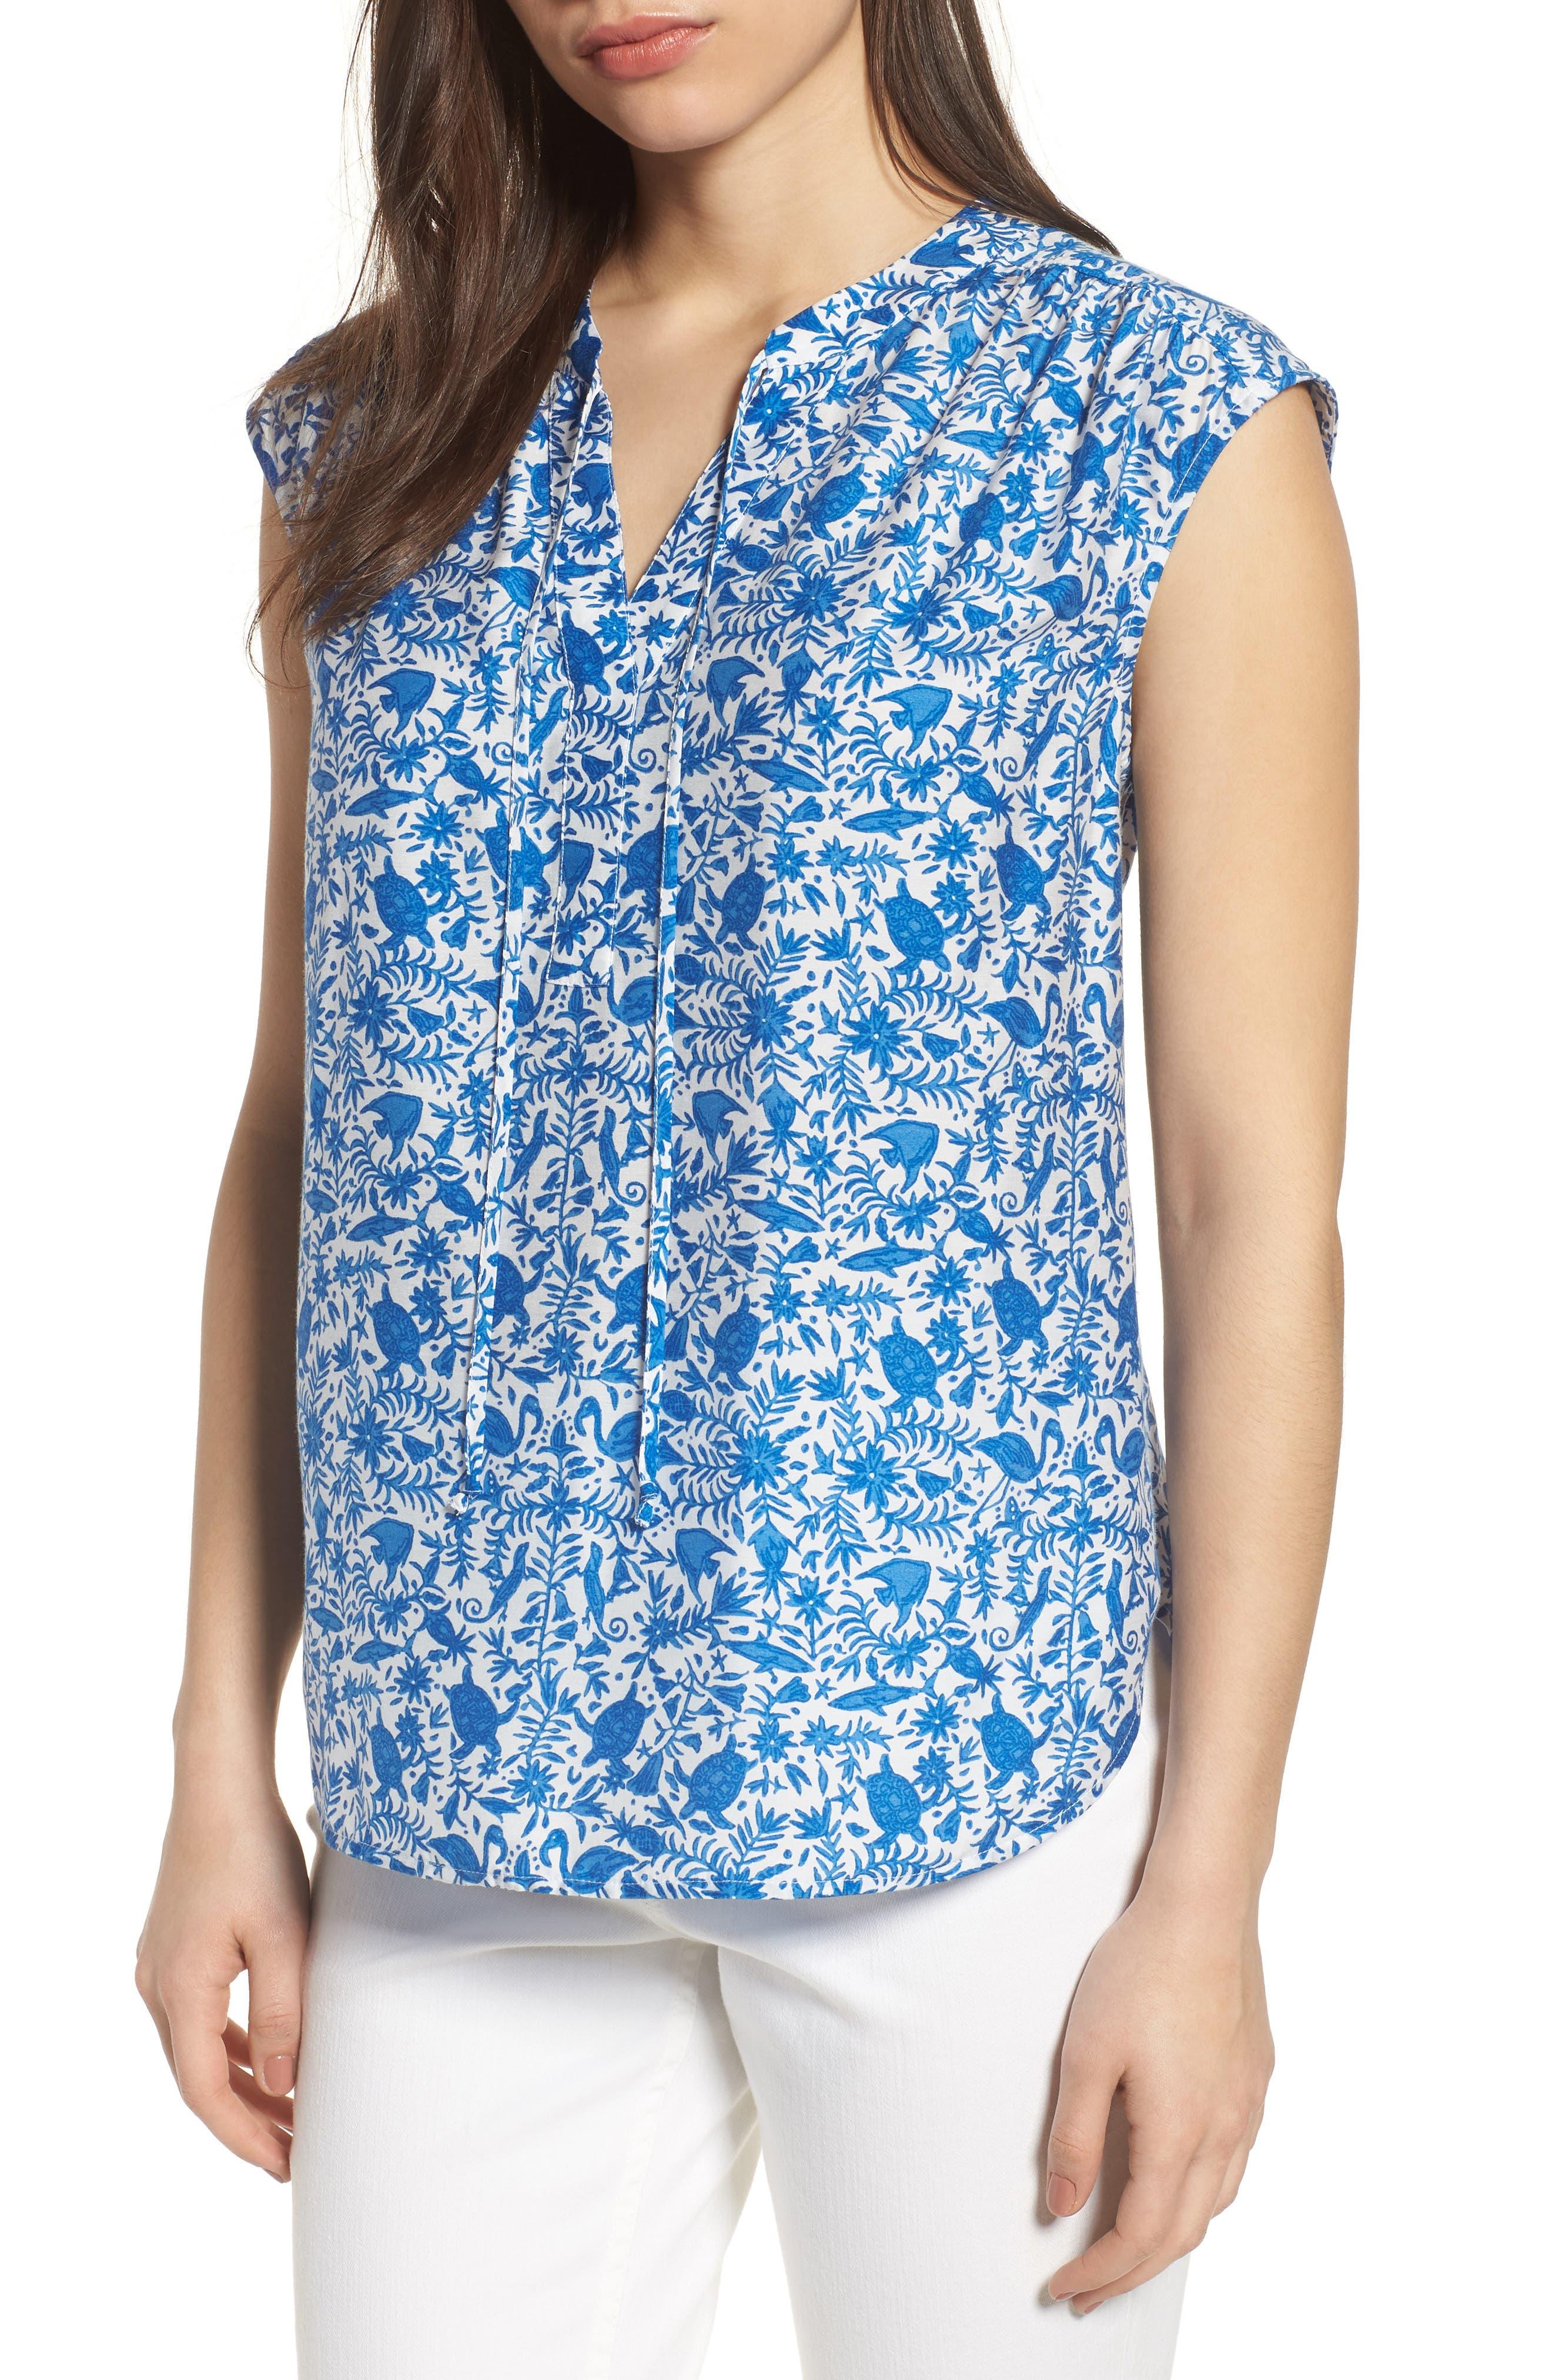 Bahamas Otomi Sleeveless Cotton Top,                         Main,                         color, Yacht Blue